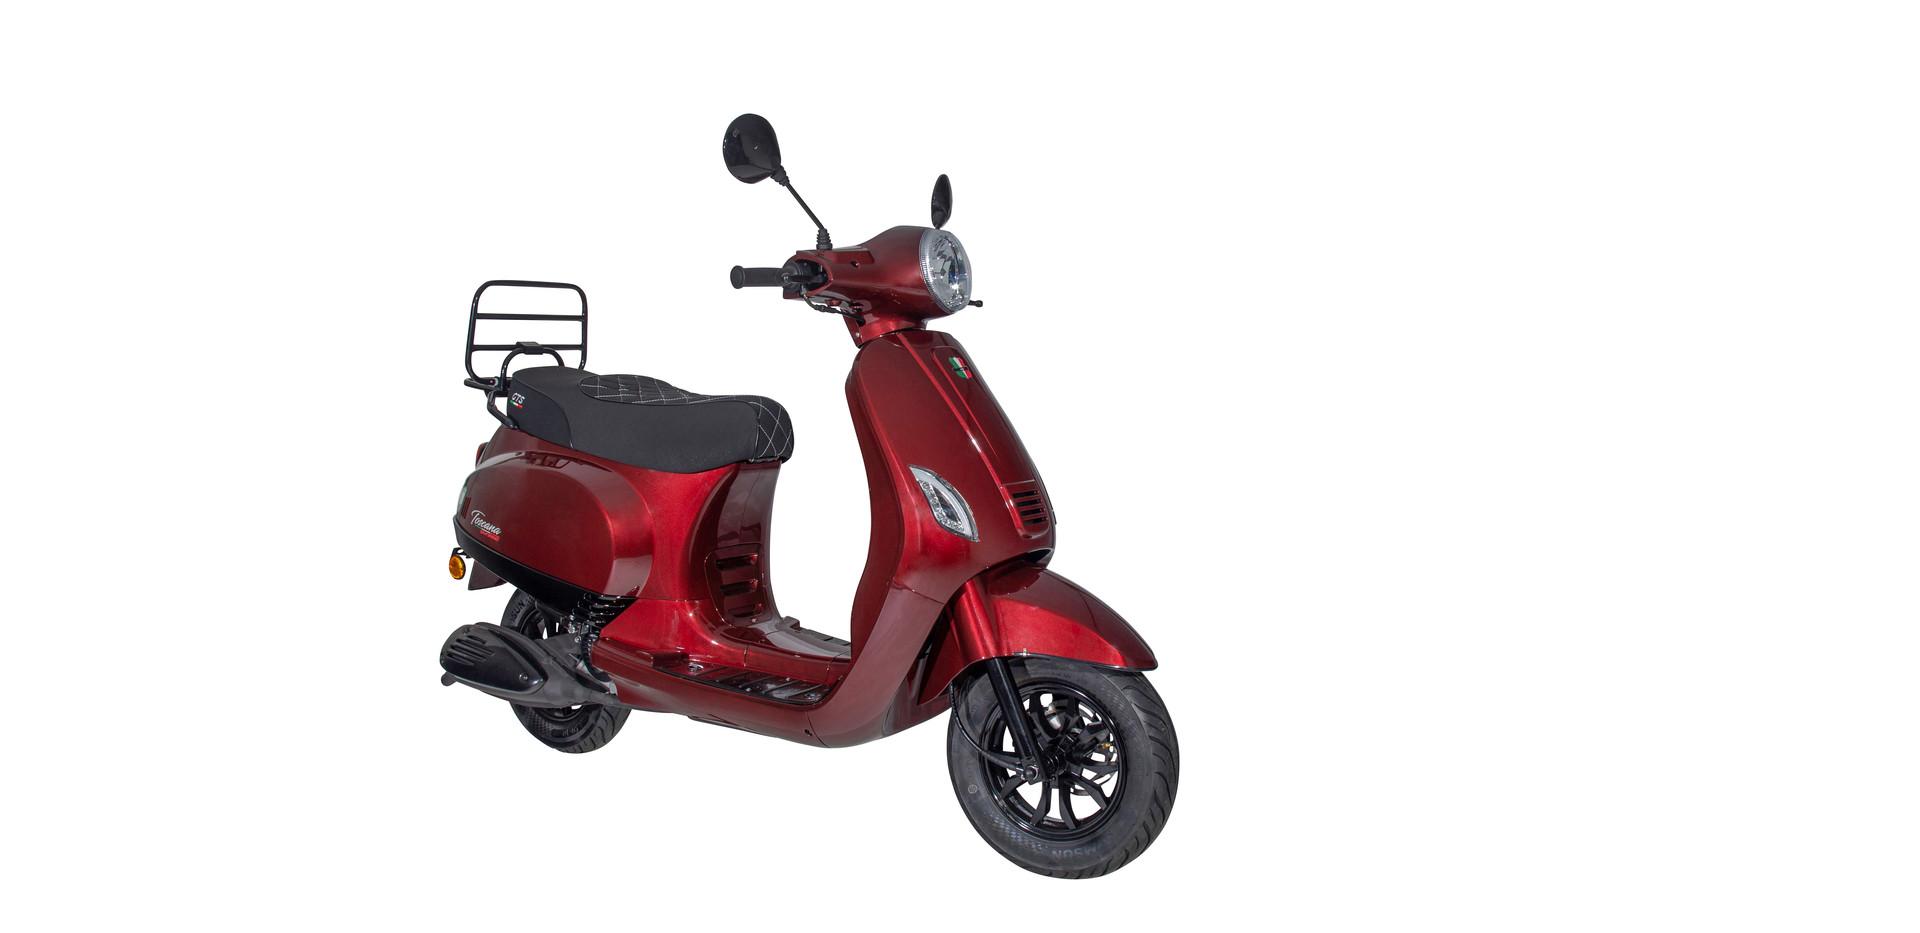 Toscana dynamic firenze red 2.jpg